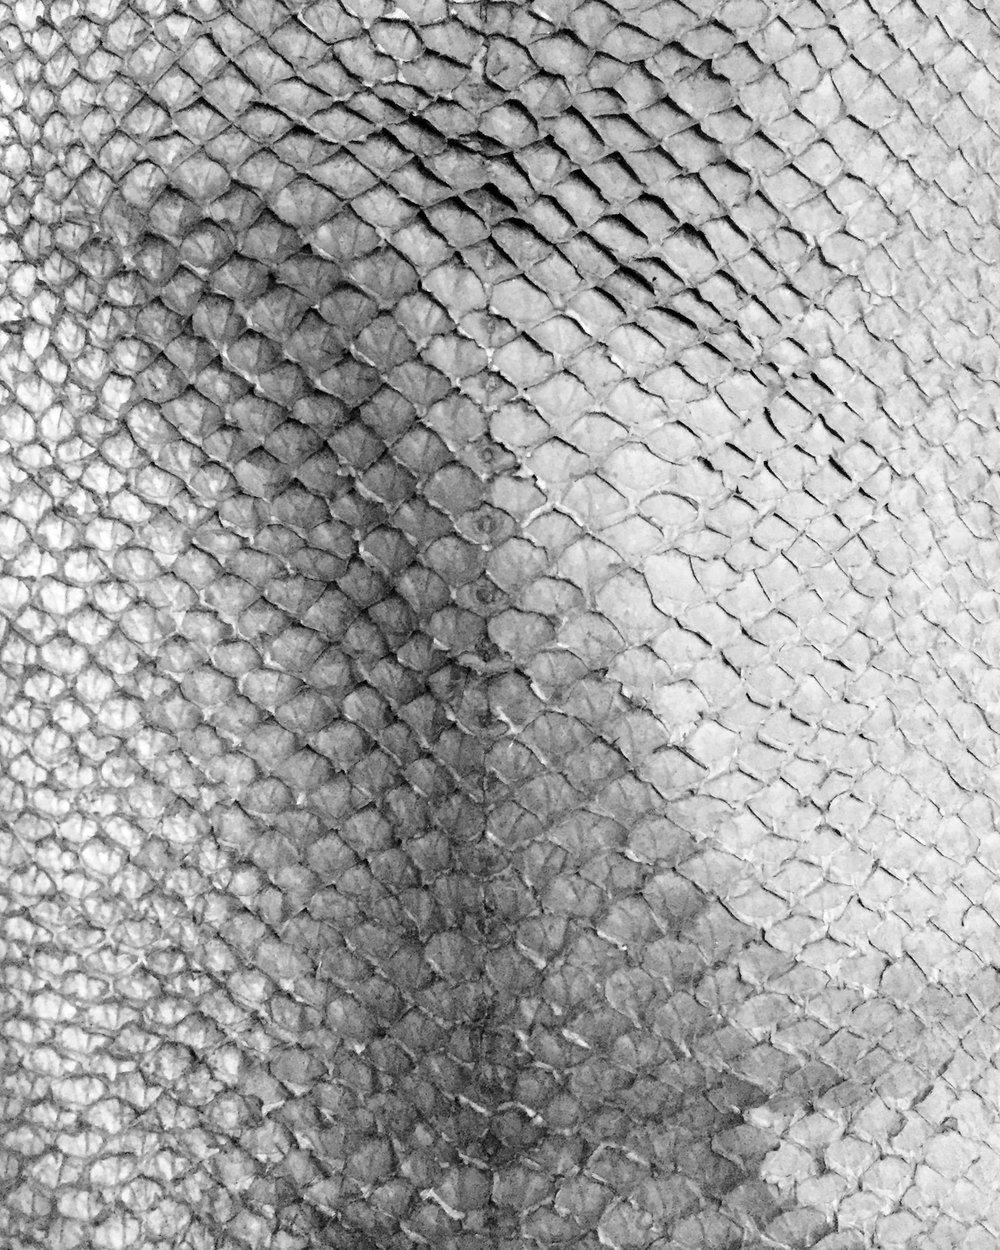 aitch-aitch-salmon-skin.jpg